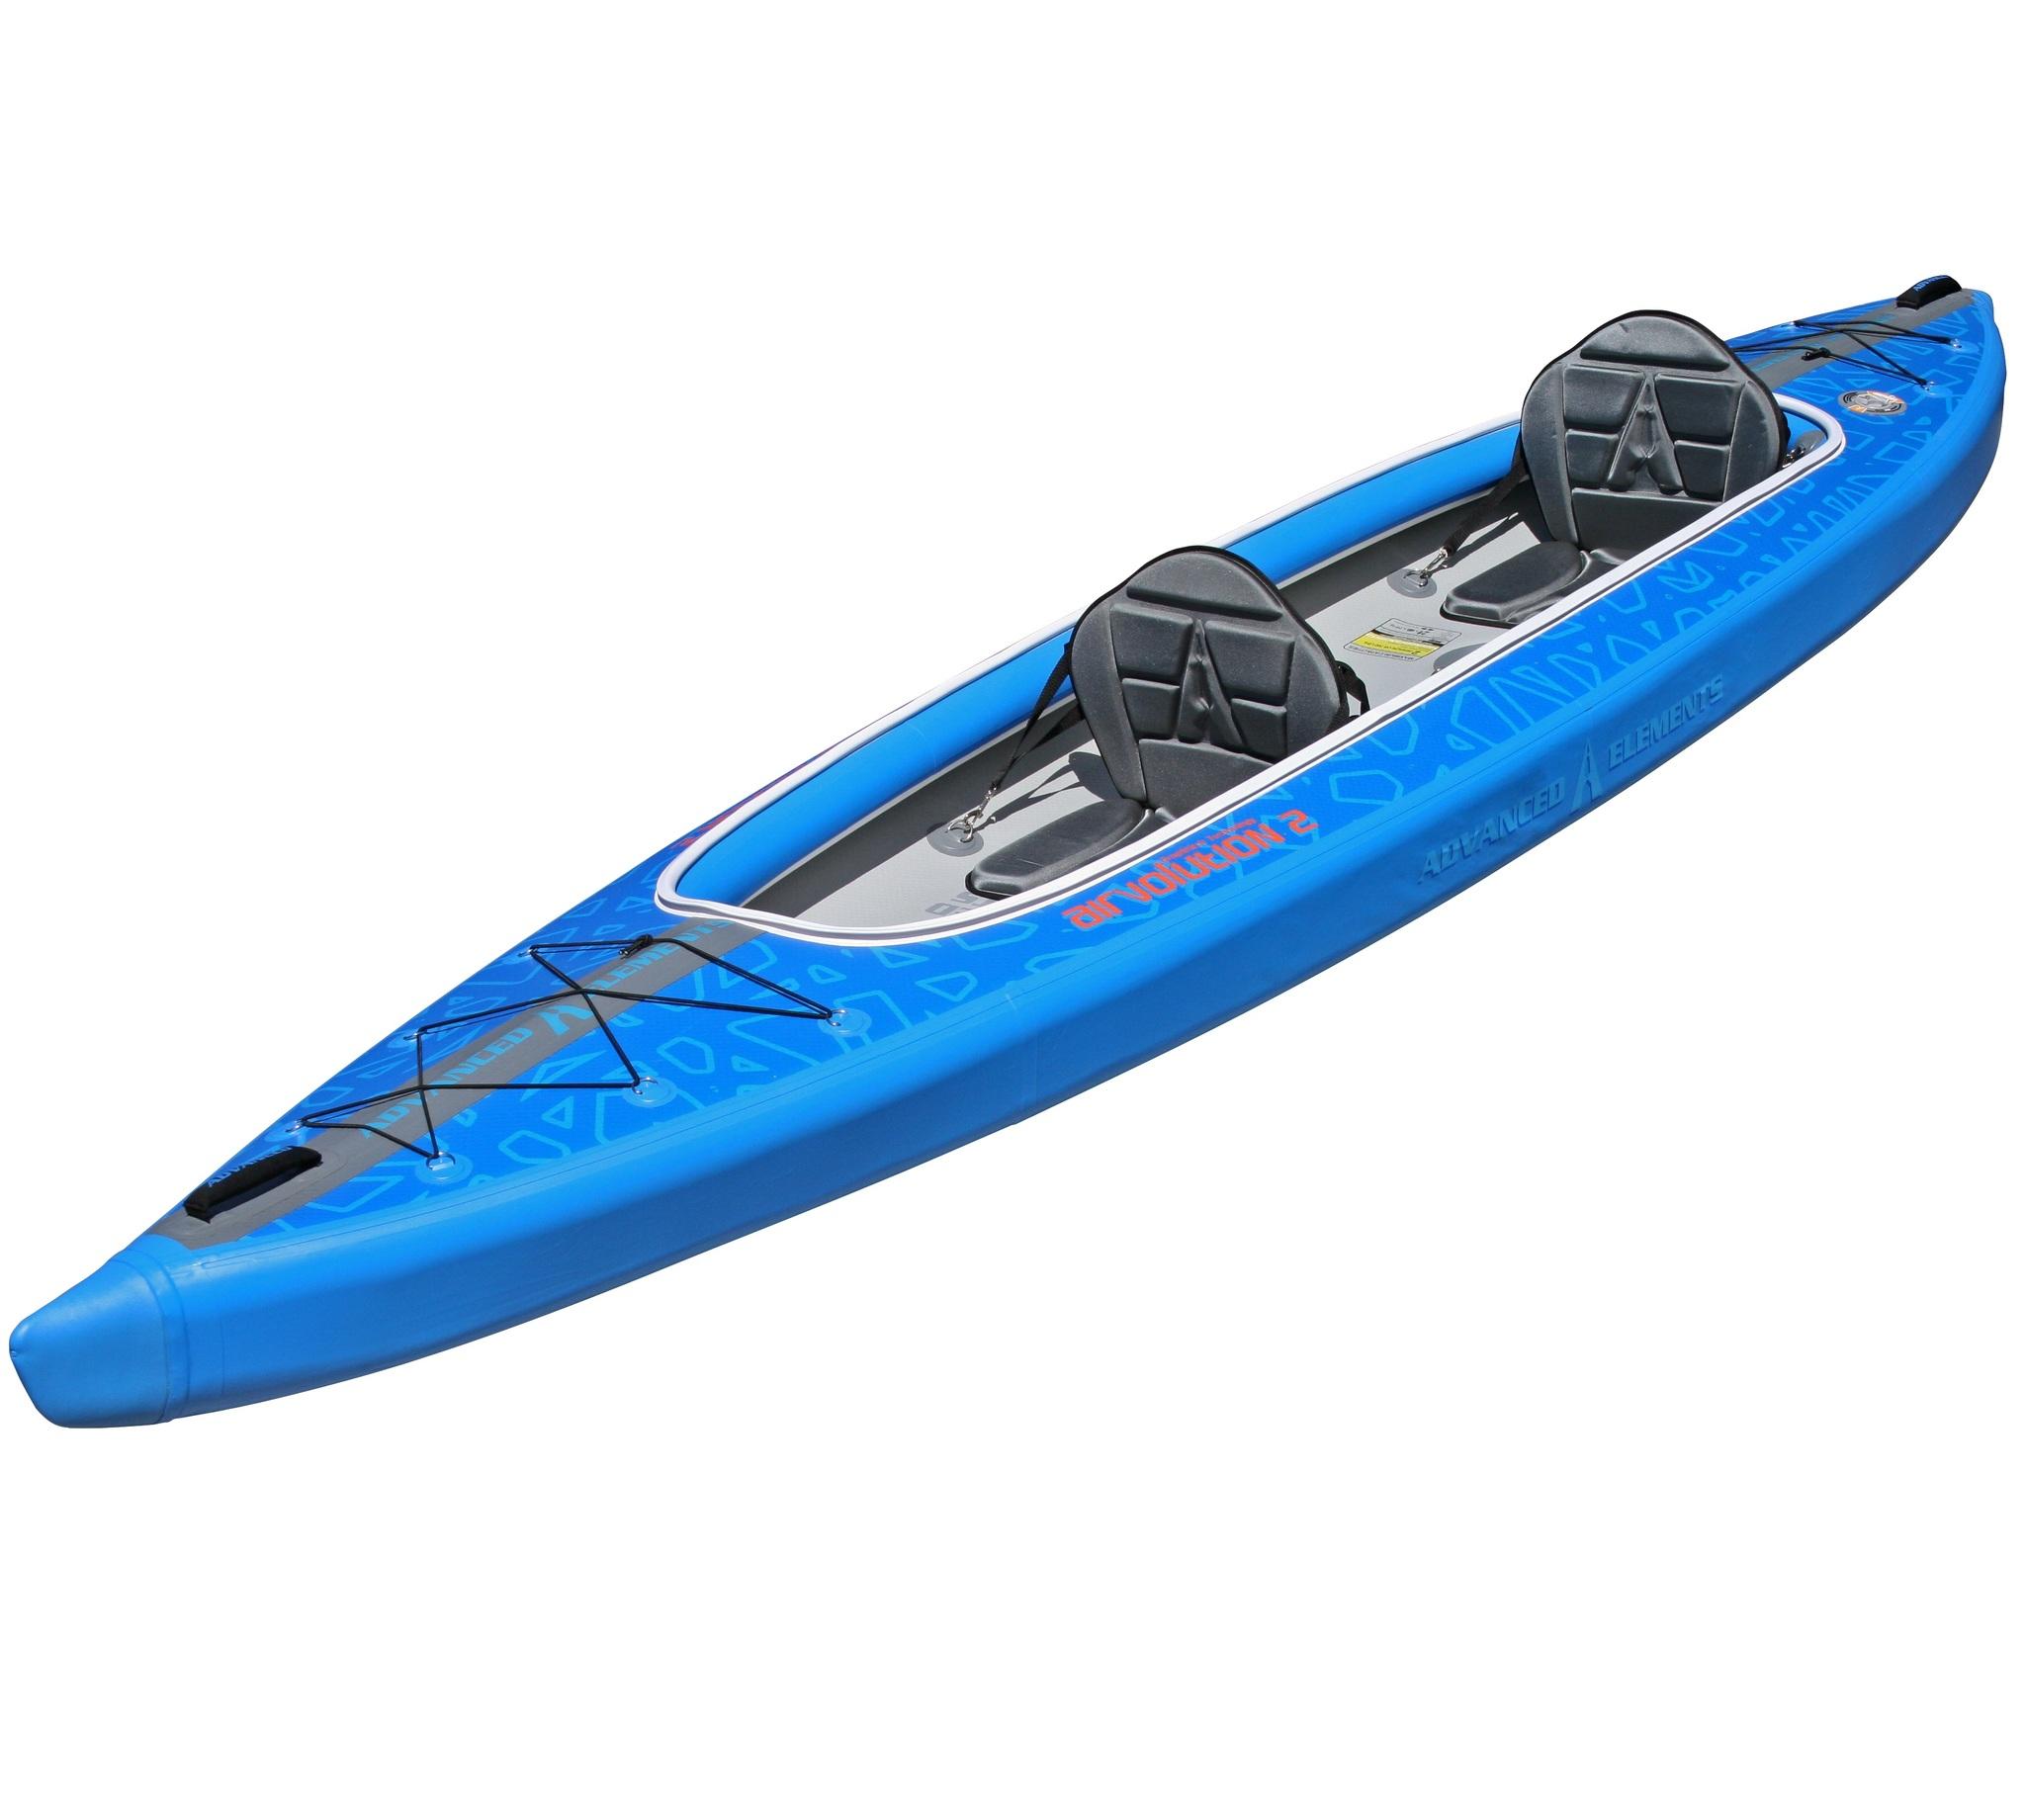 Recreational Airvolution inflatable kayaks